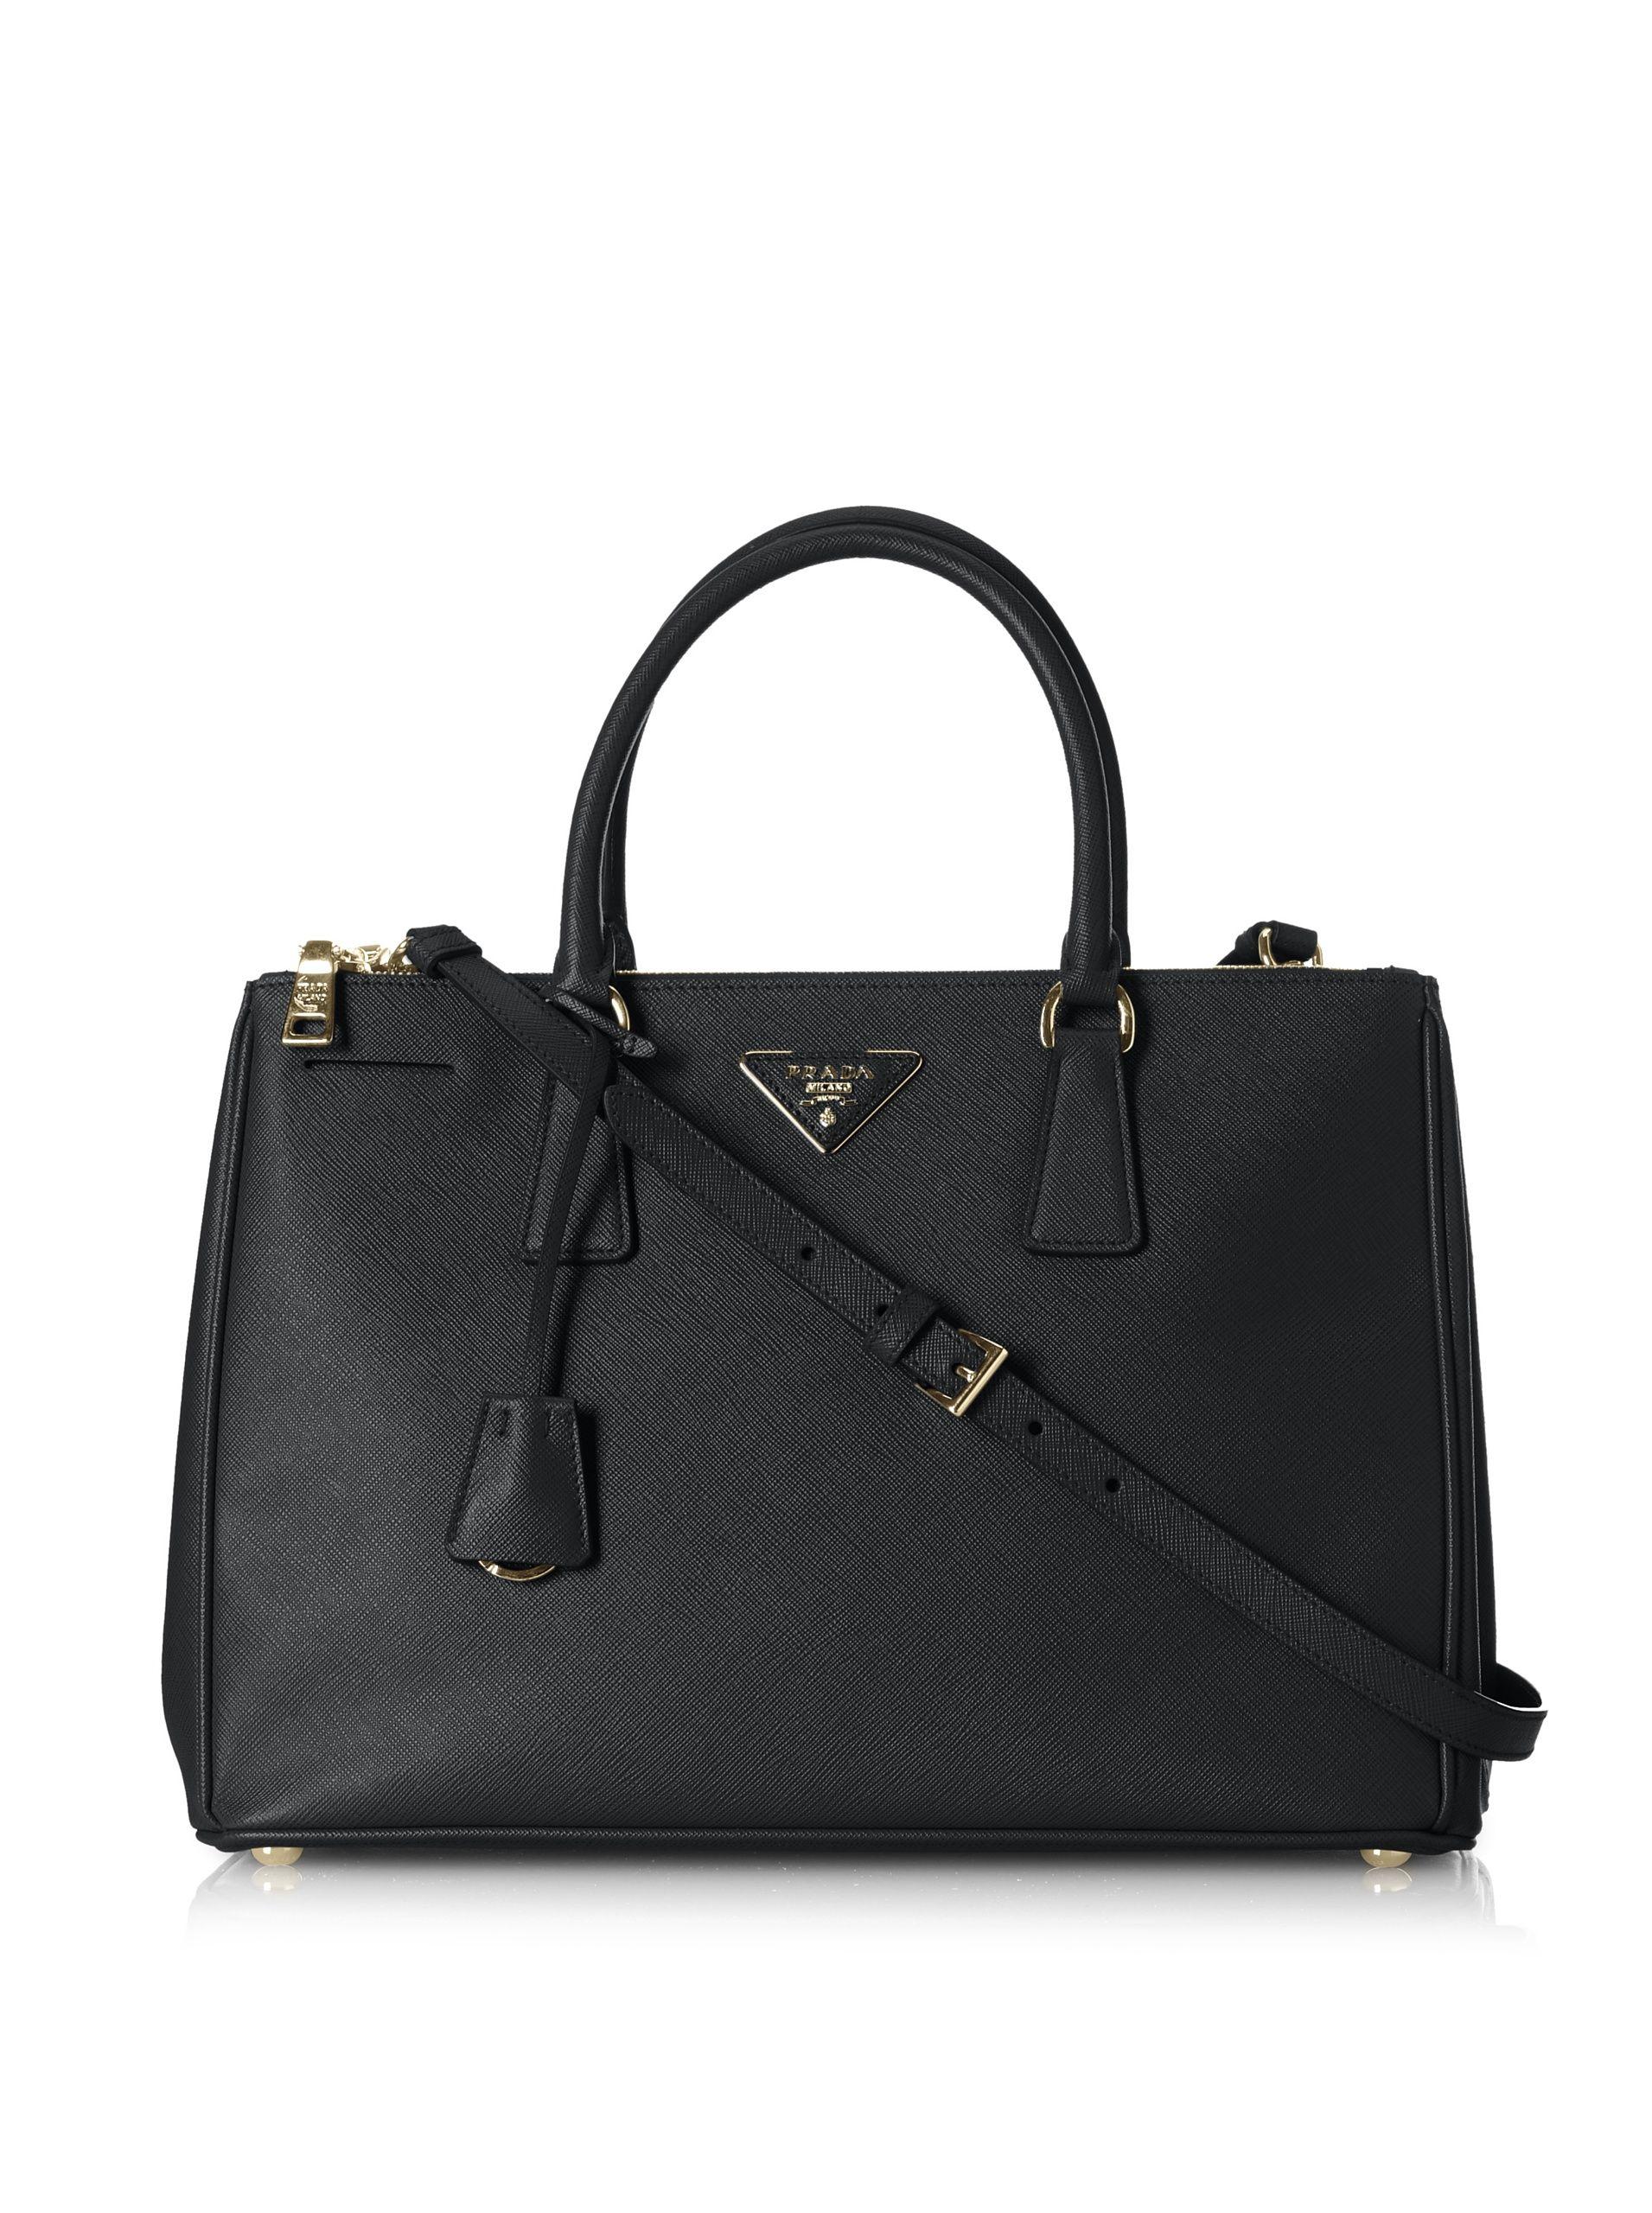 2a3a8b067674 Prada Women s Bauletto Bag at MYHABIT  1645